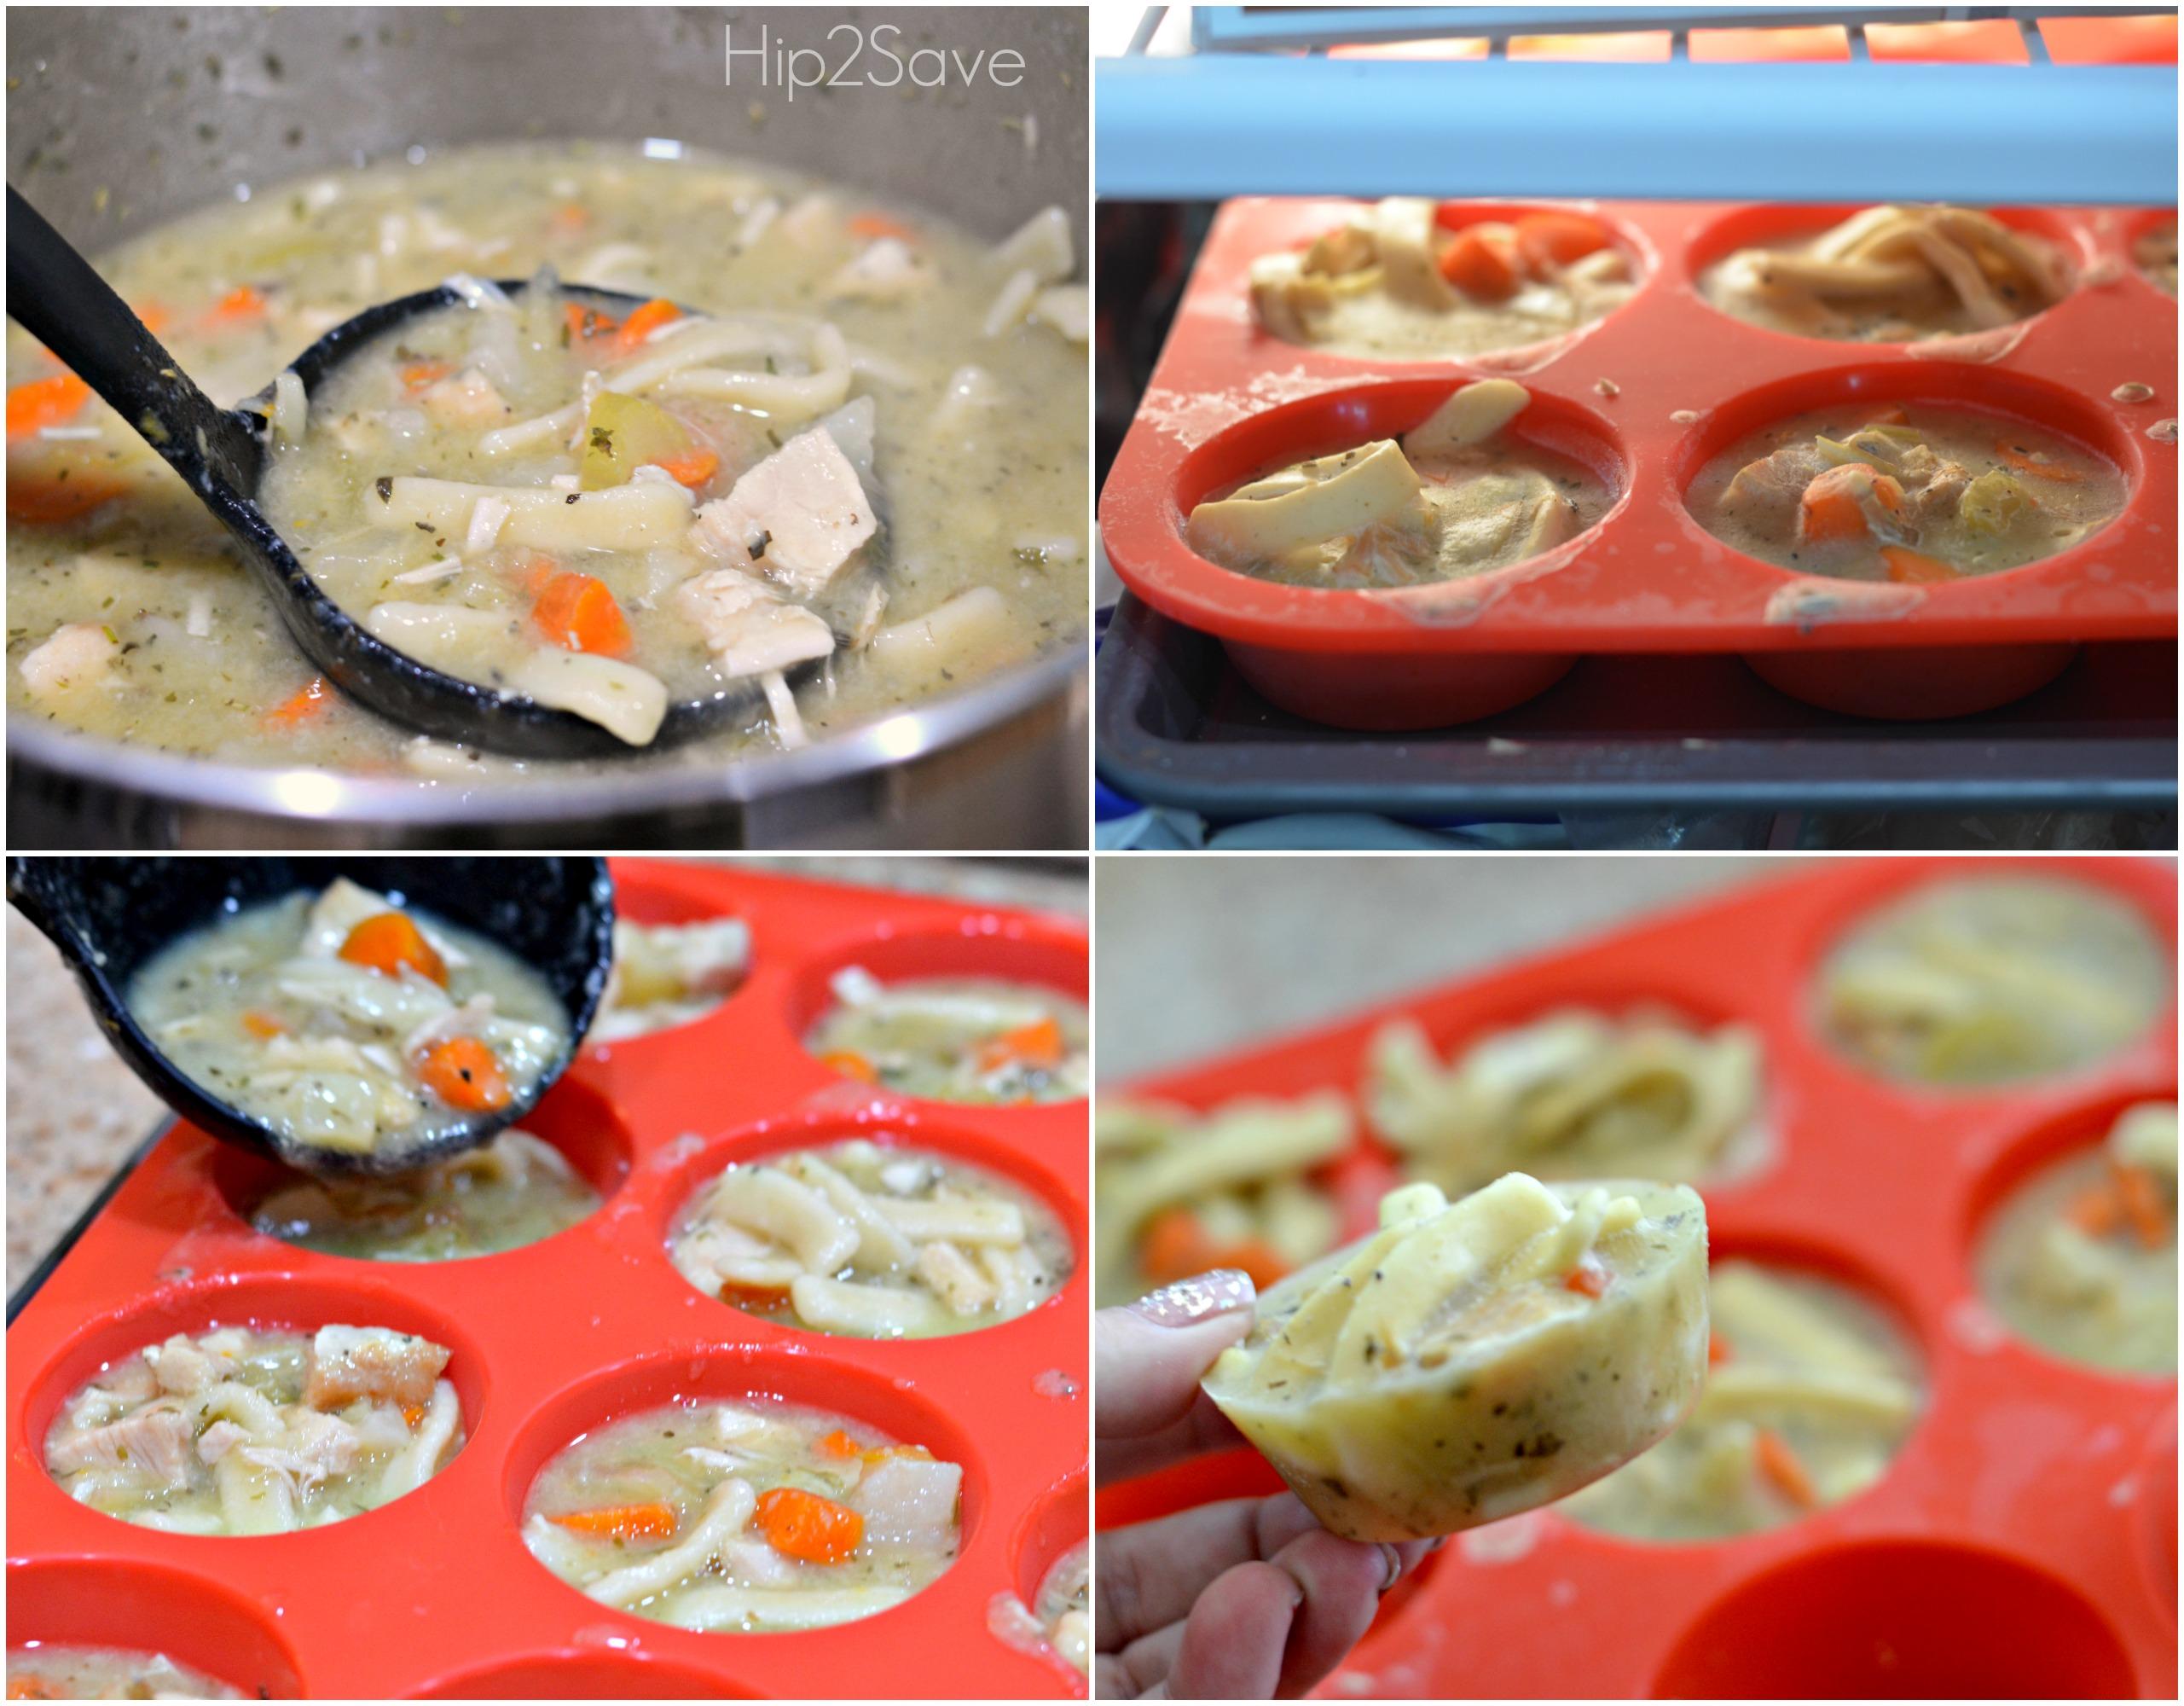 best-way-to-freeze-soup-hip2save-com